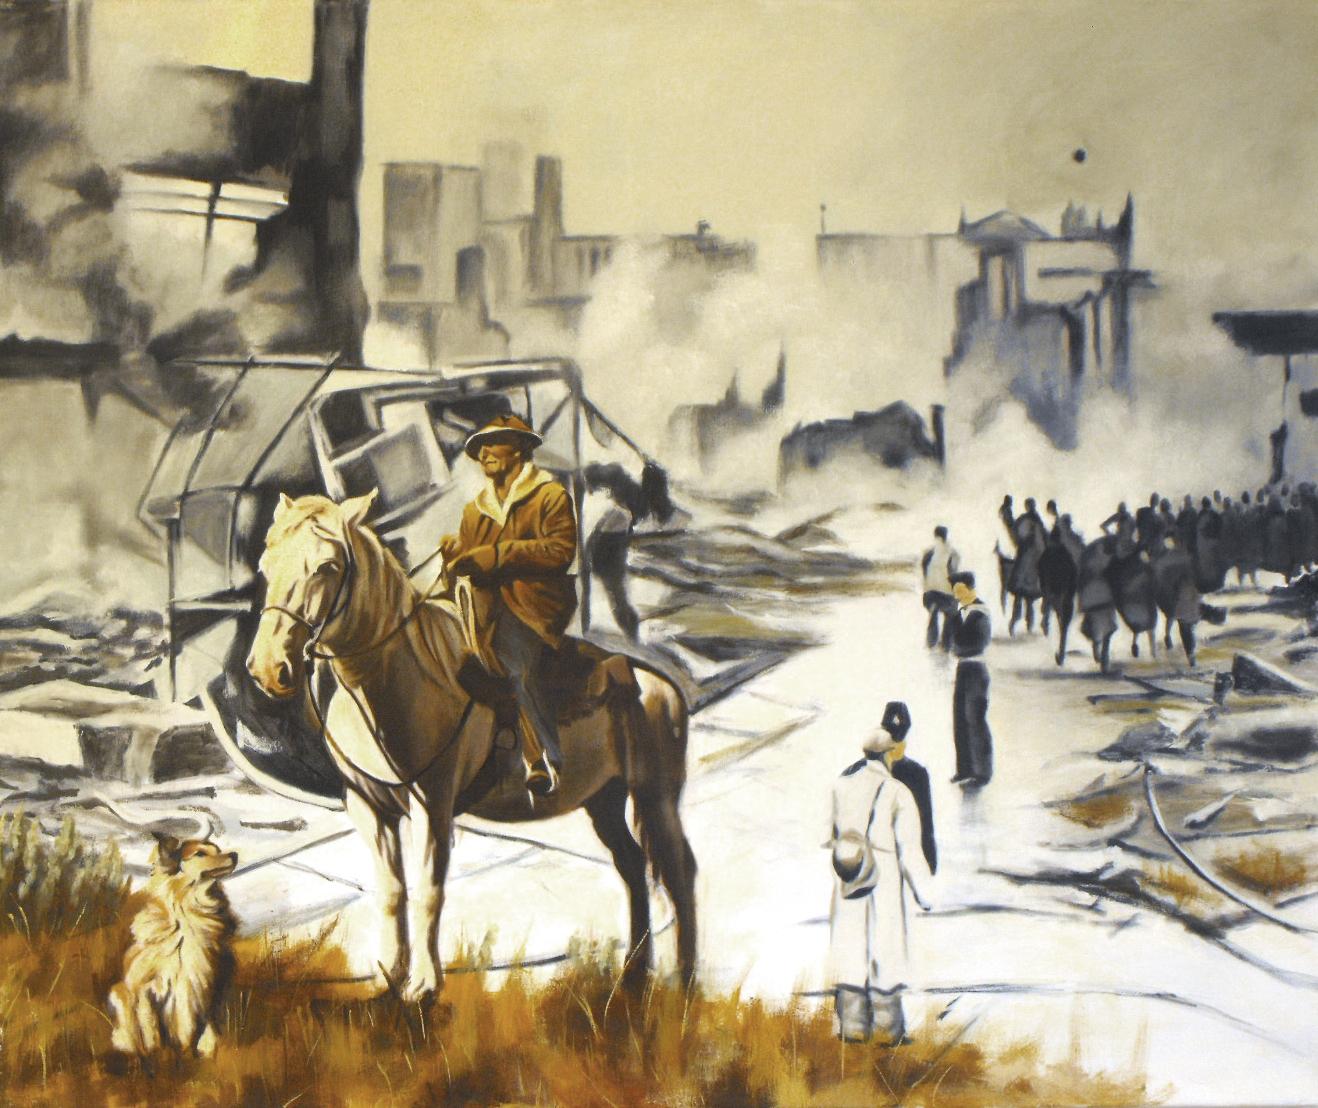 """Cowboy"", Oil on canvas, 120x100, 2013"